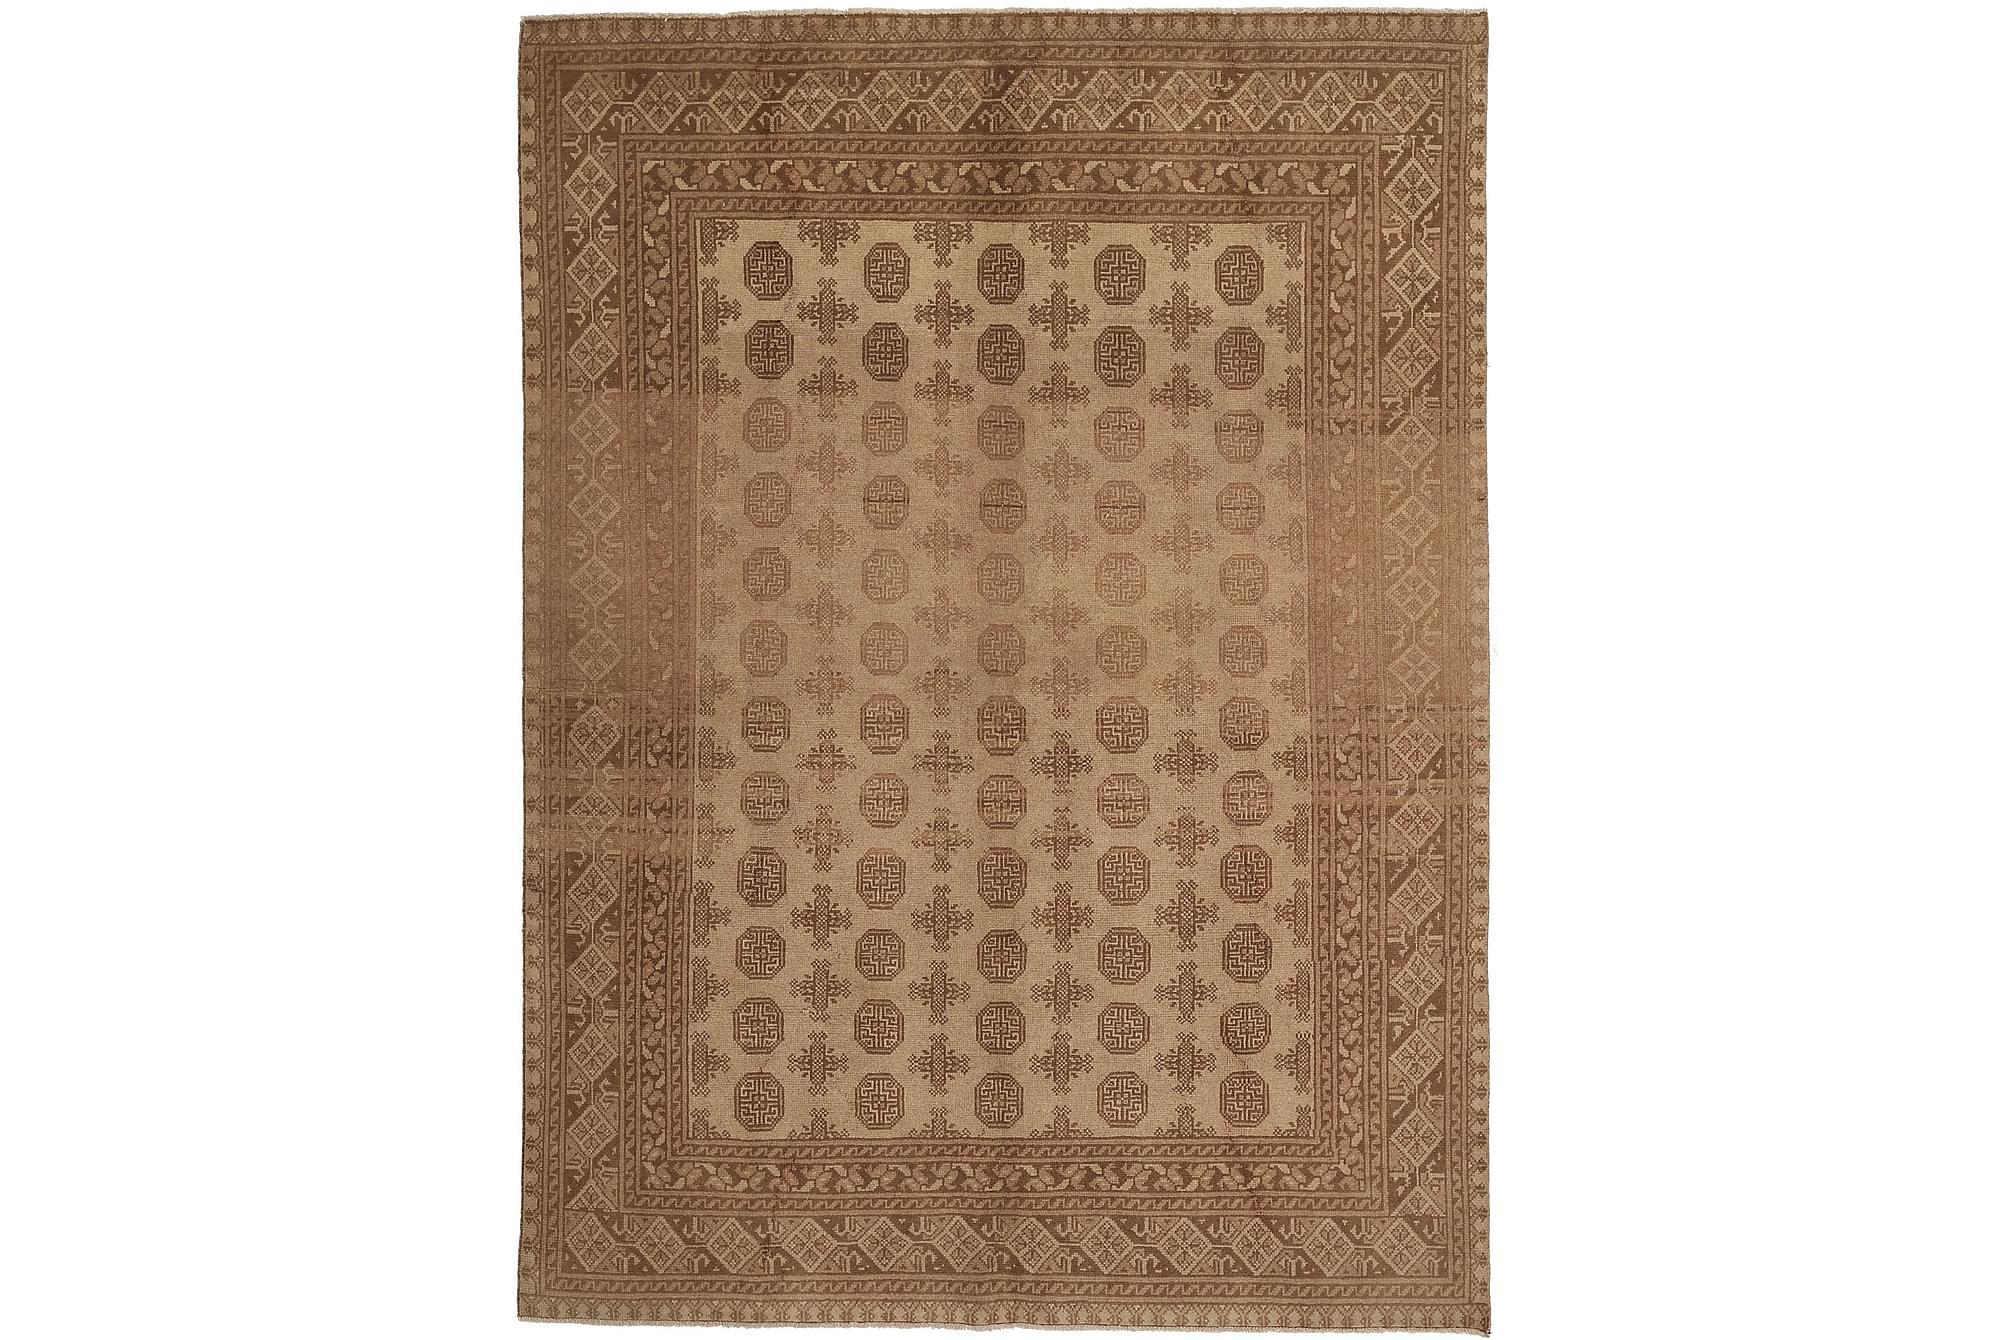 AFGHAN Matta 191x271 Stor Beige/Brun, Orientaliska mattor